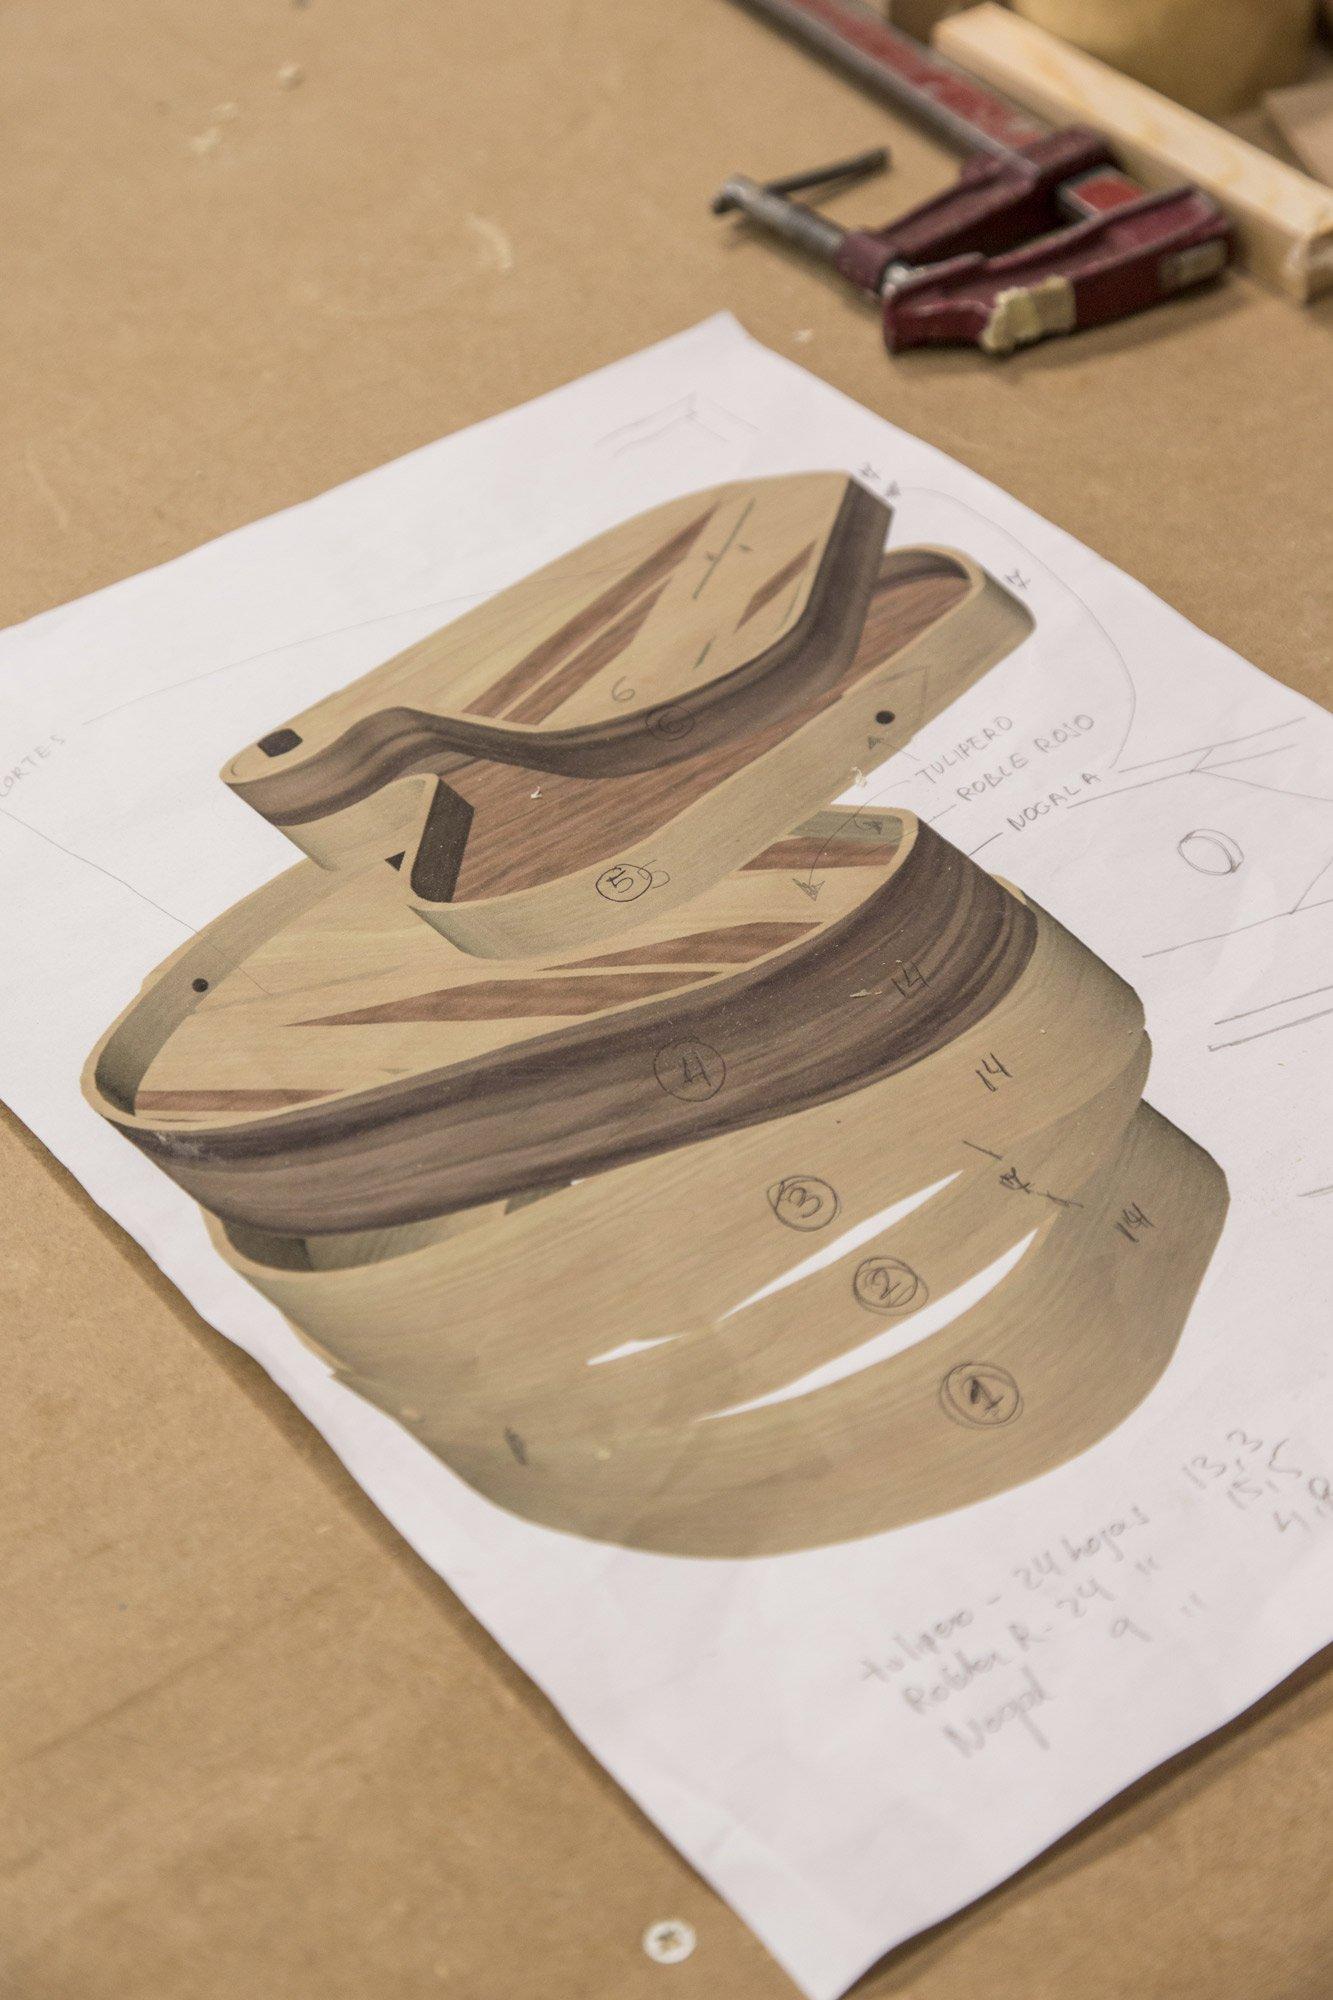 Image of 3D design for 'Ribbon' tables © Uxío Da Vila